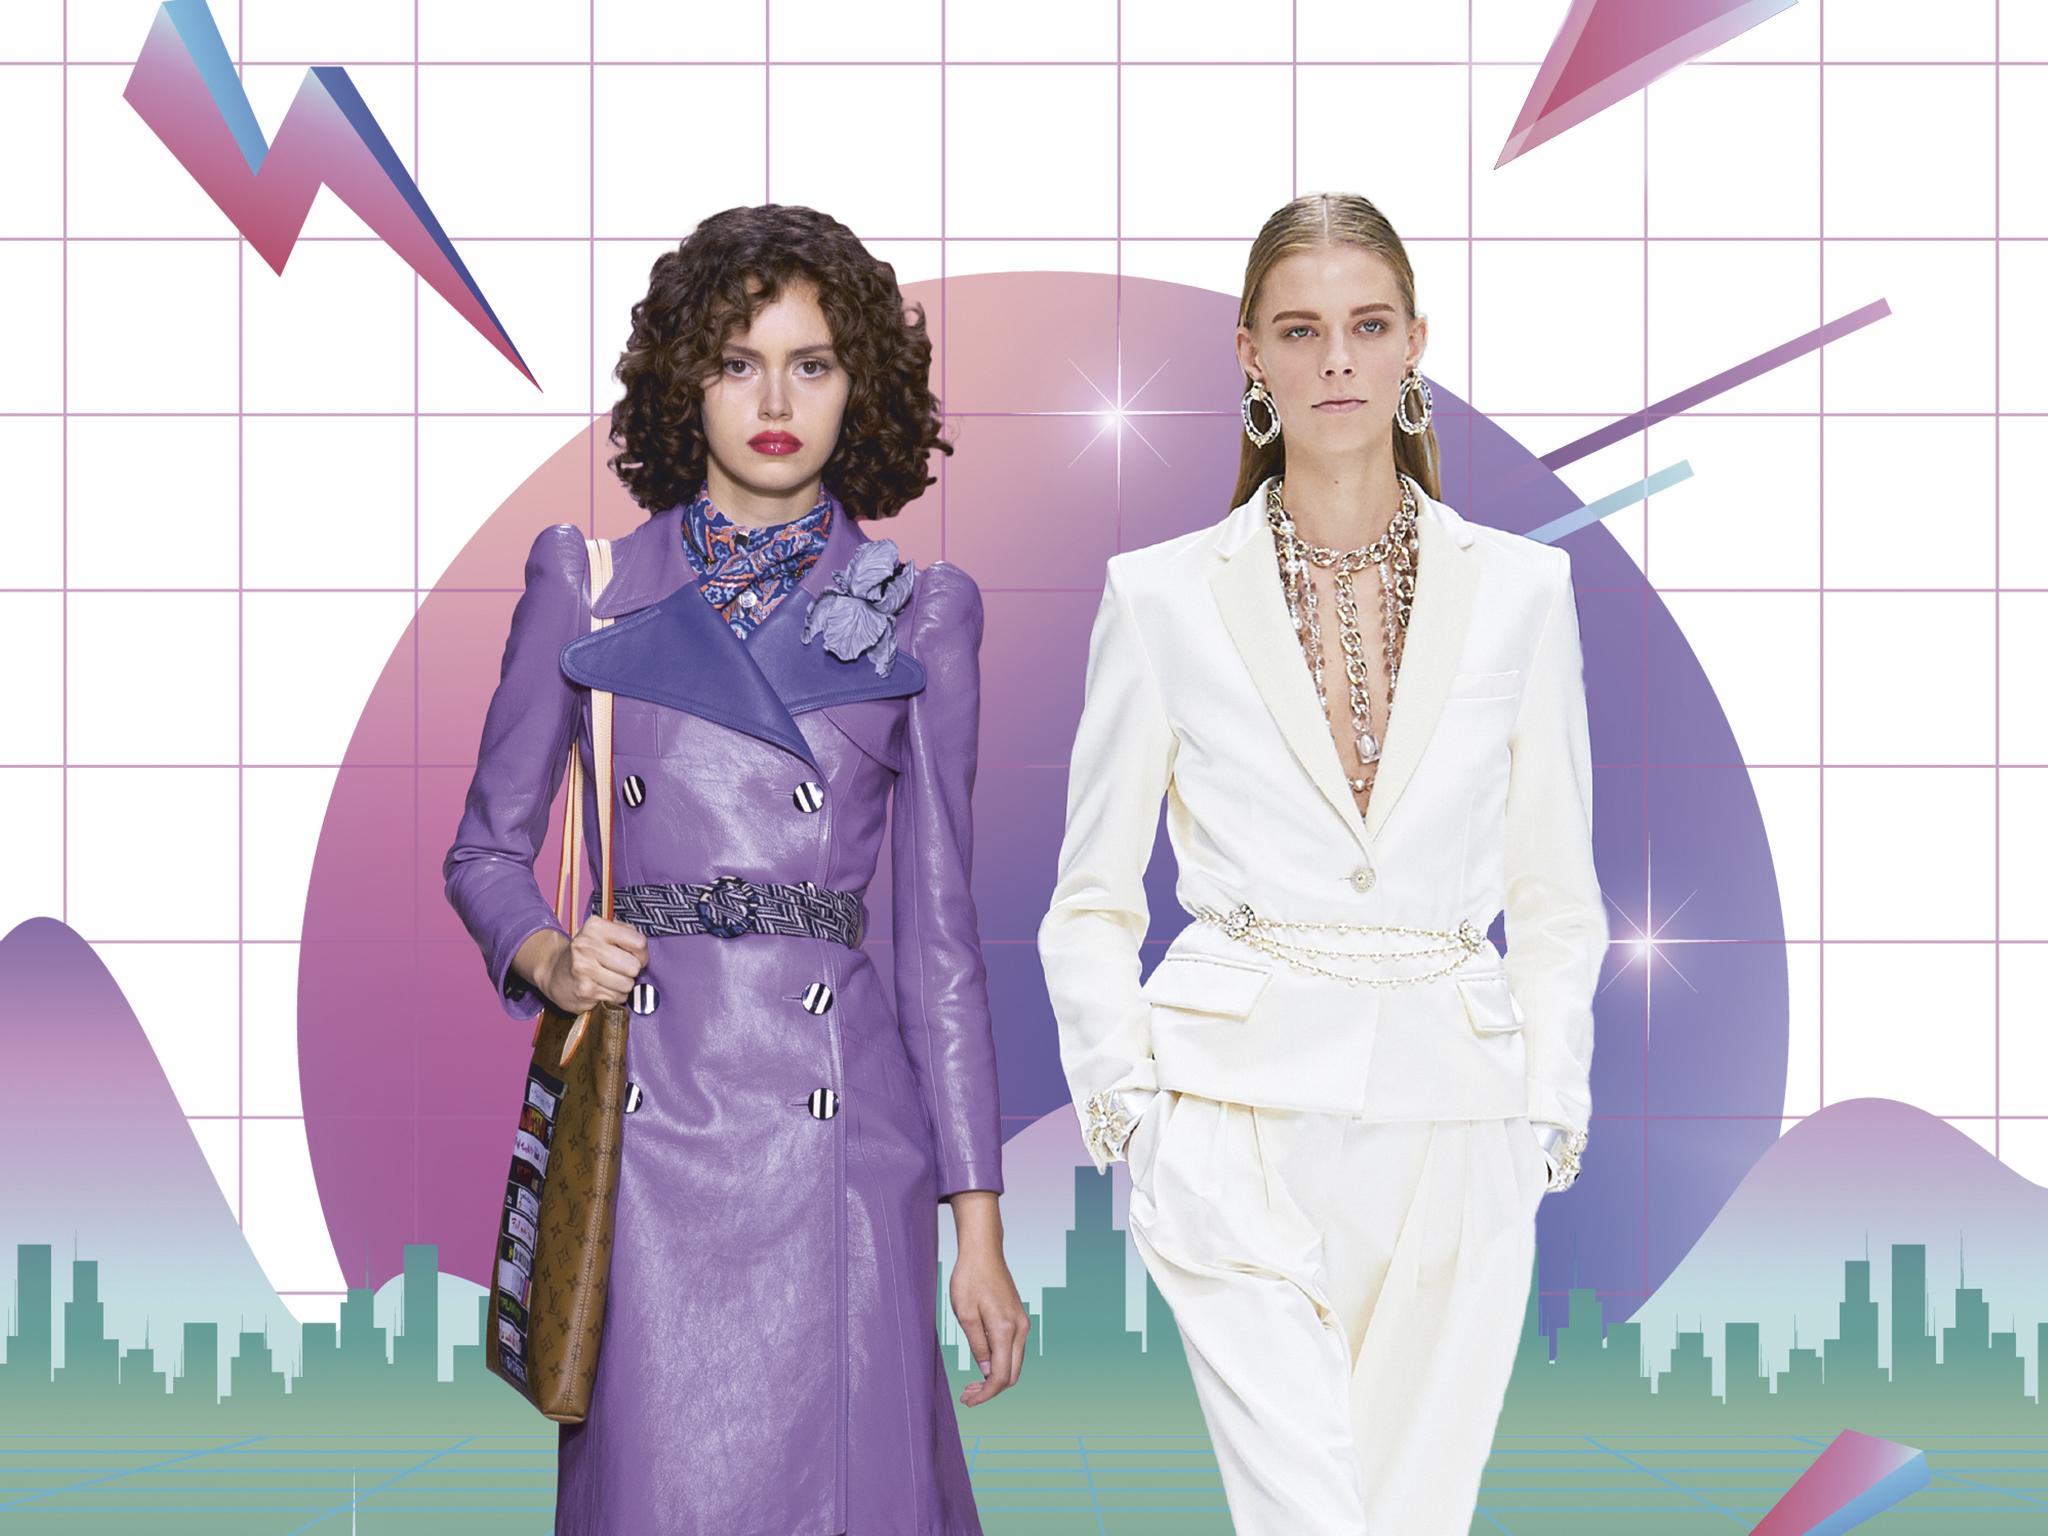 2020 visions——fashion trend 2020